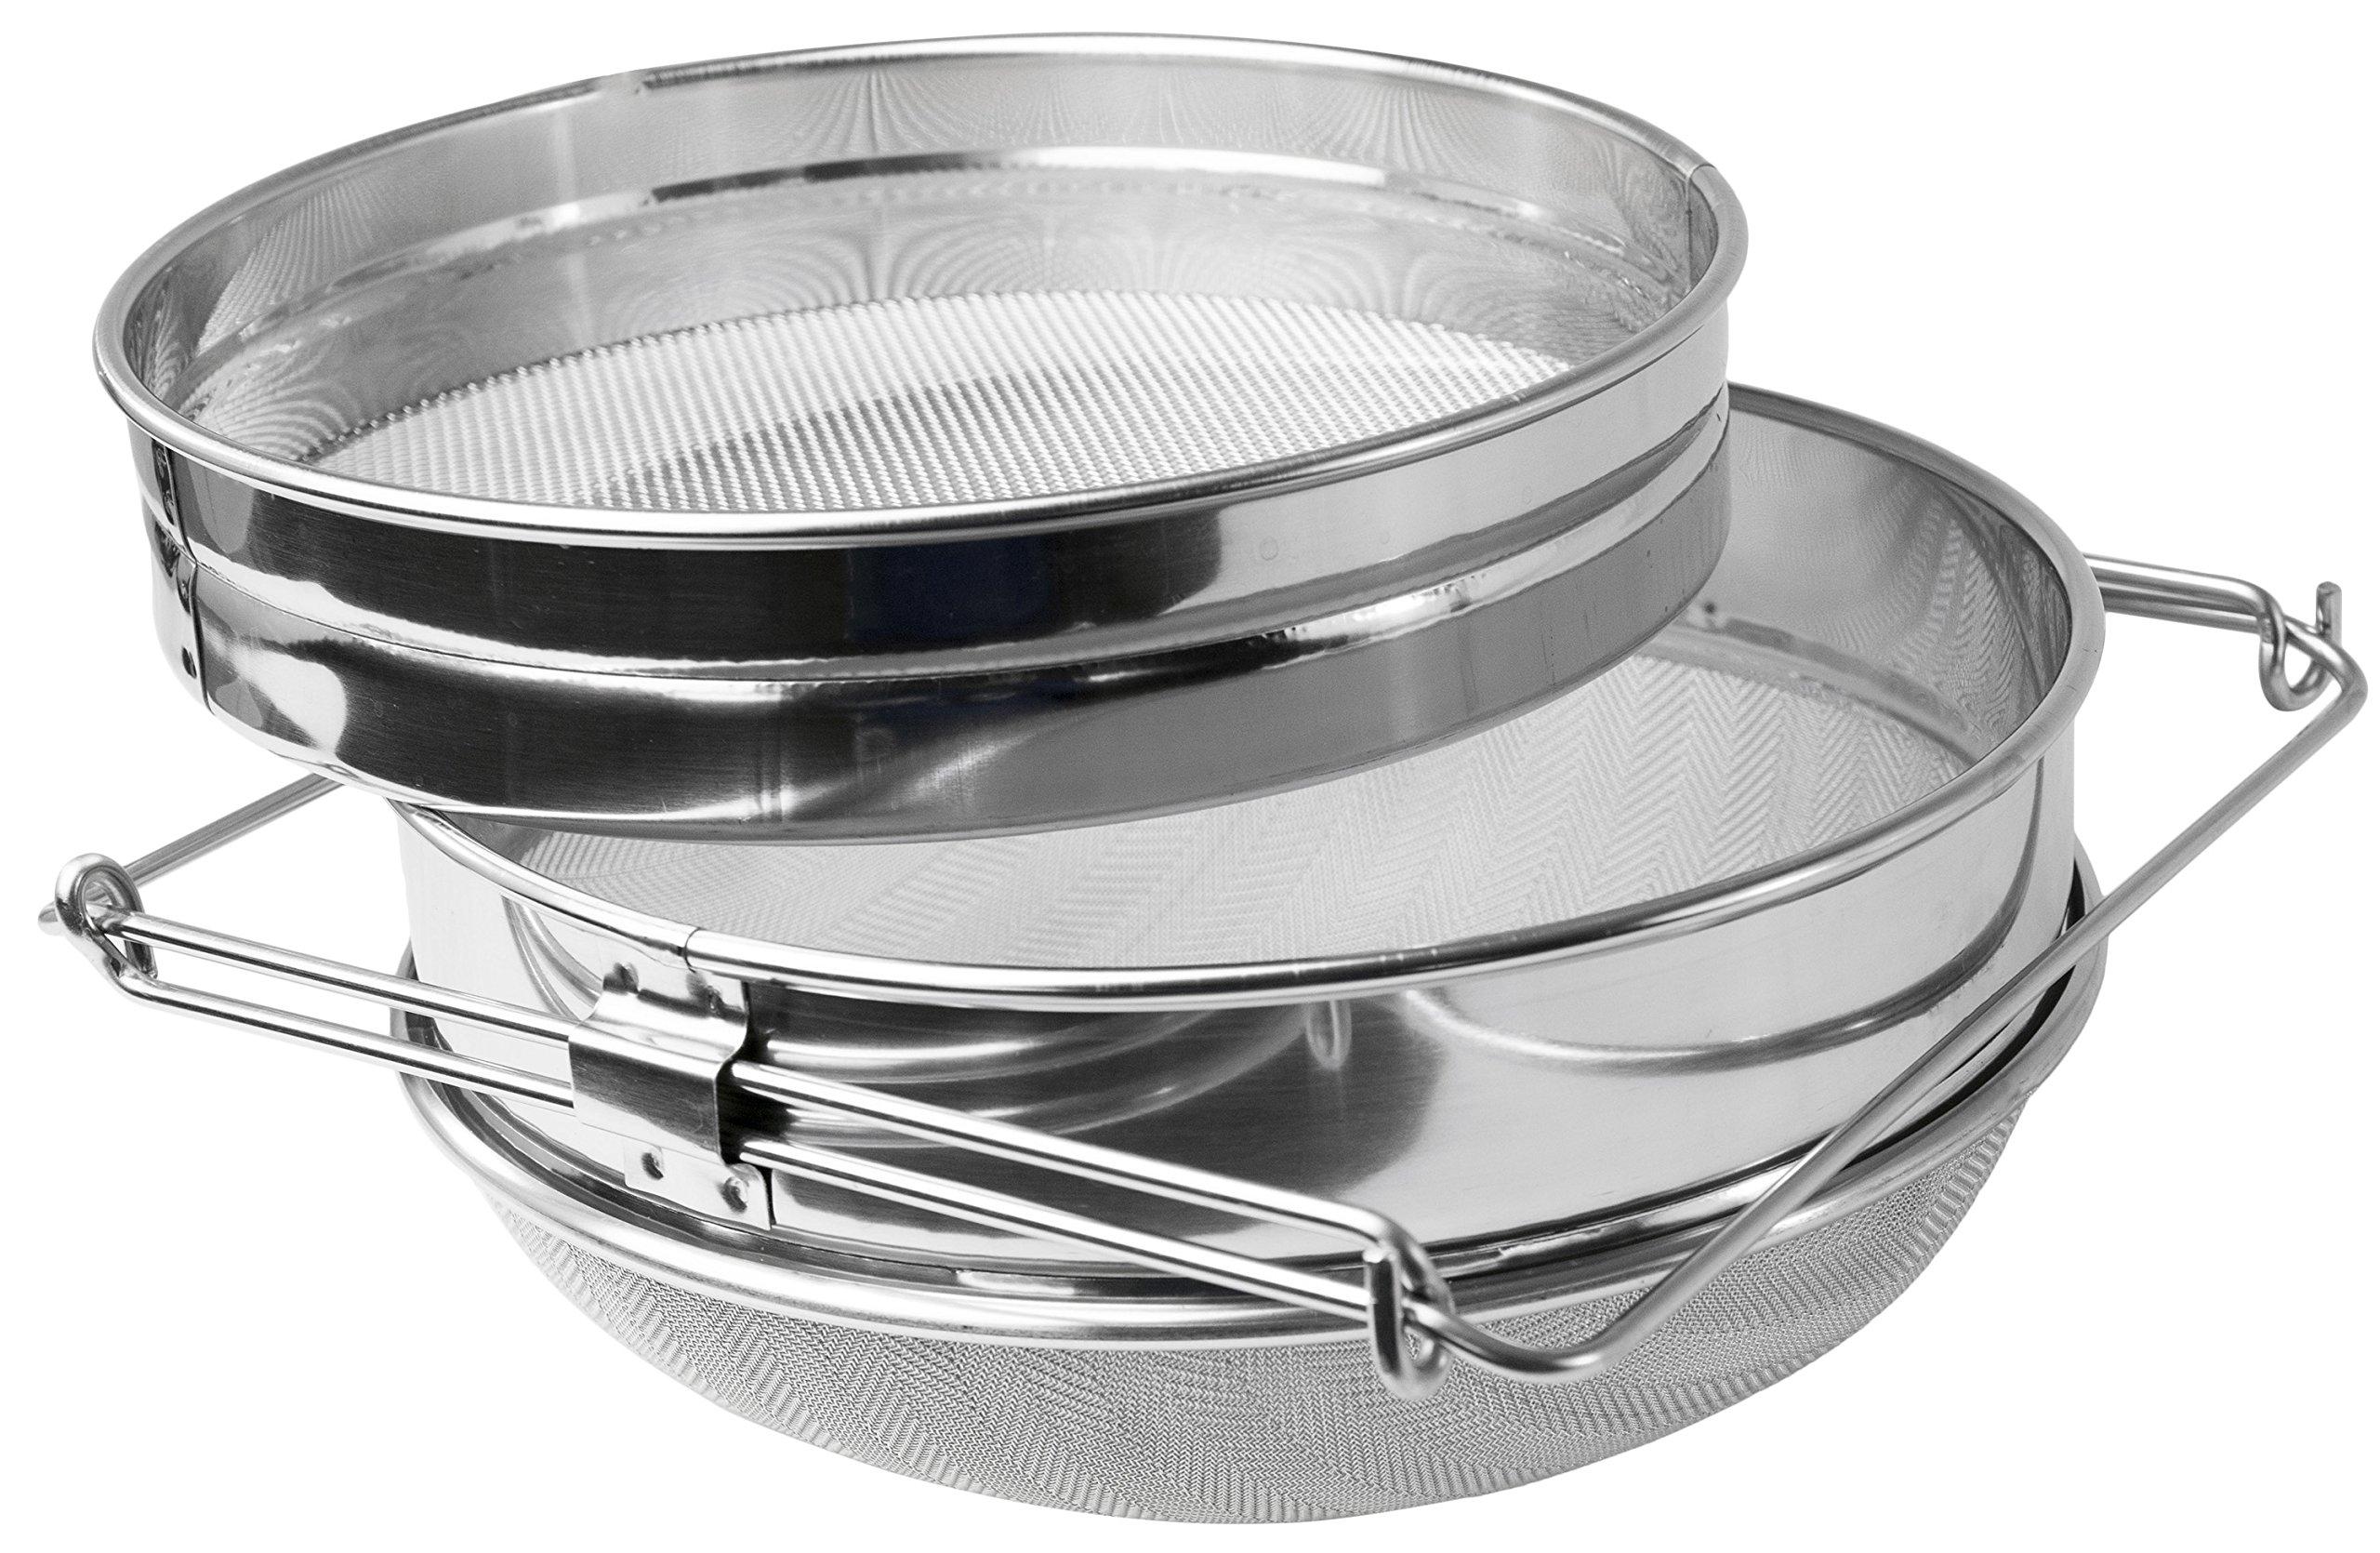 VIVO Honey Strainer Double Sieve Stainless Steel Beekeeping Equipment Filter (BEE-V101H)